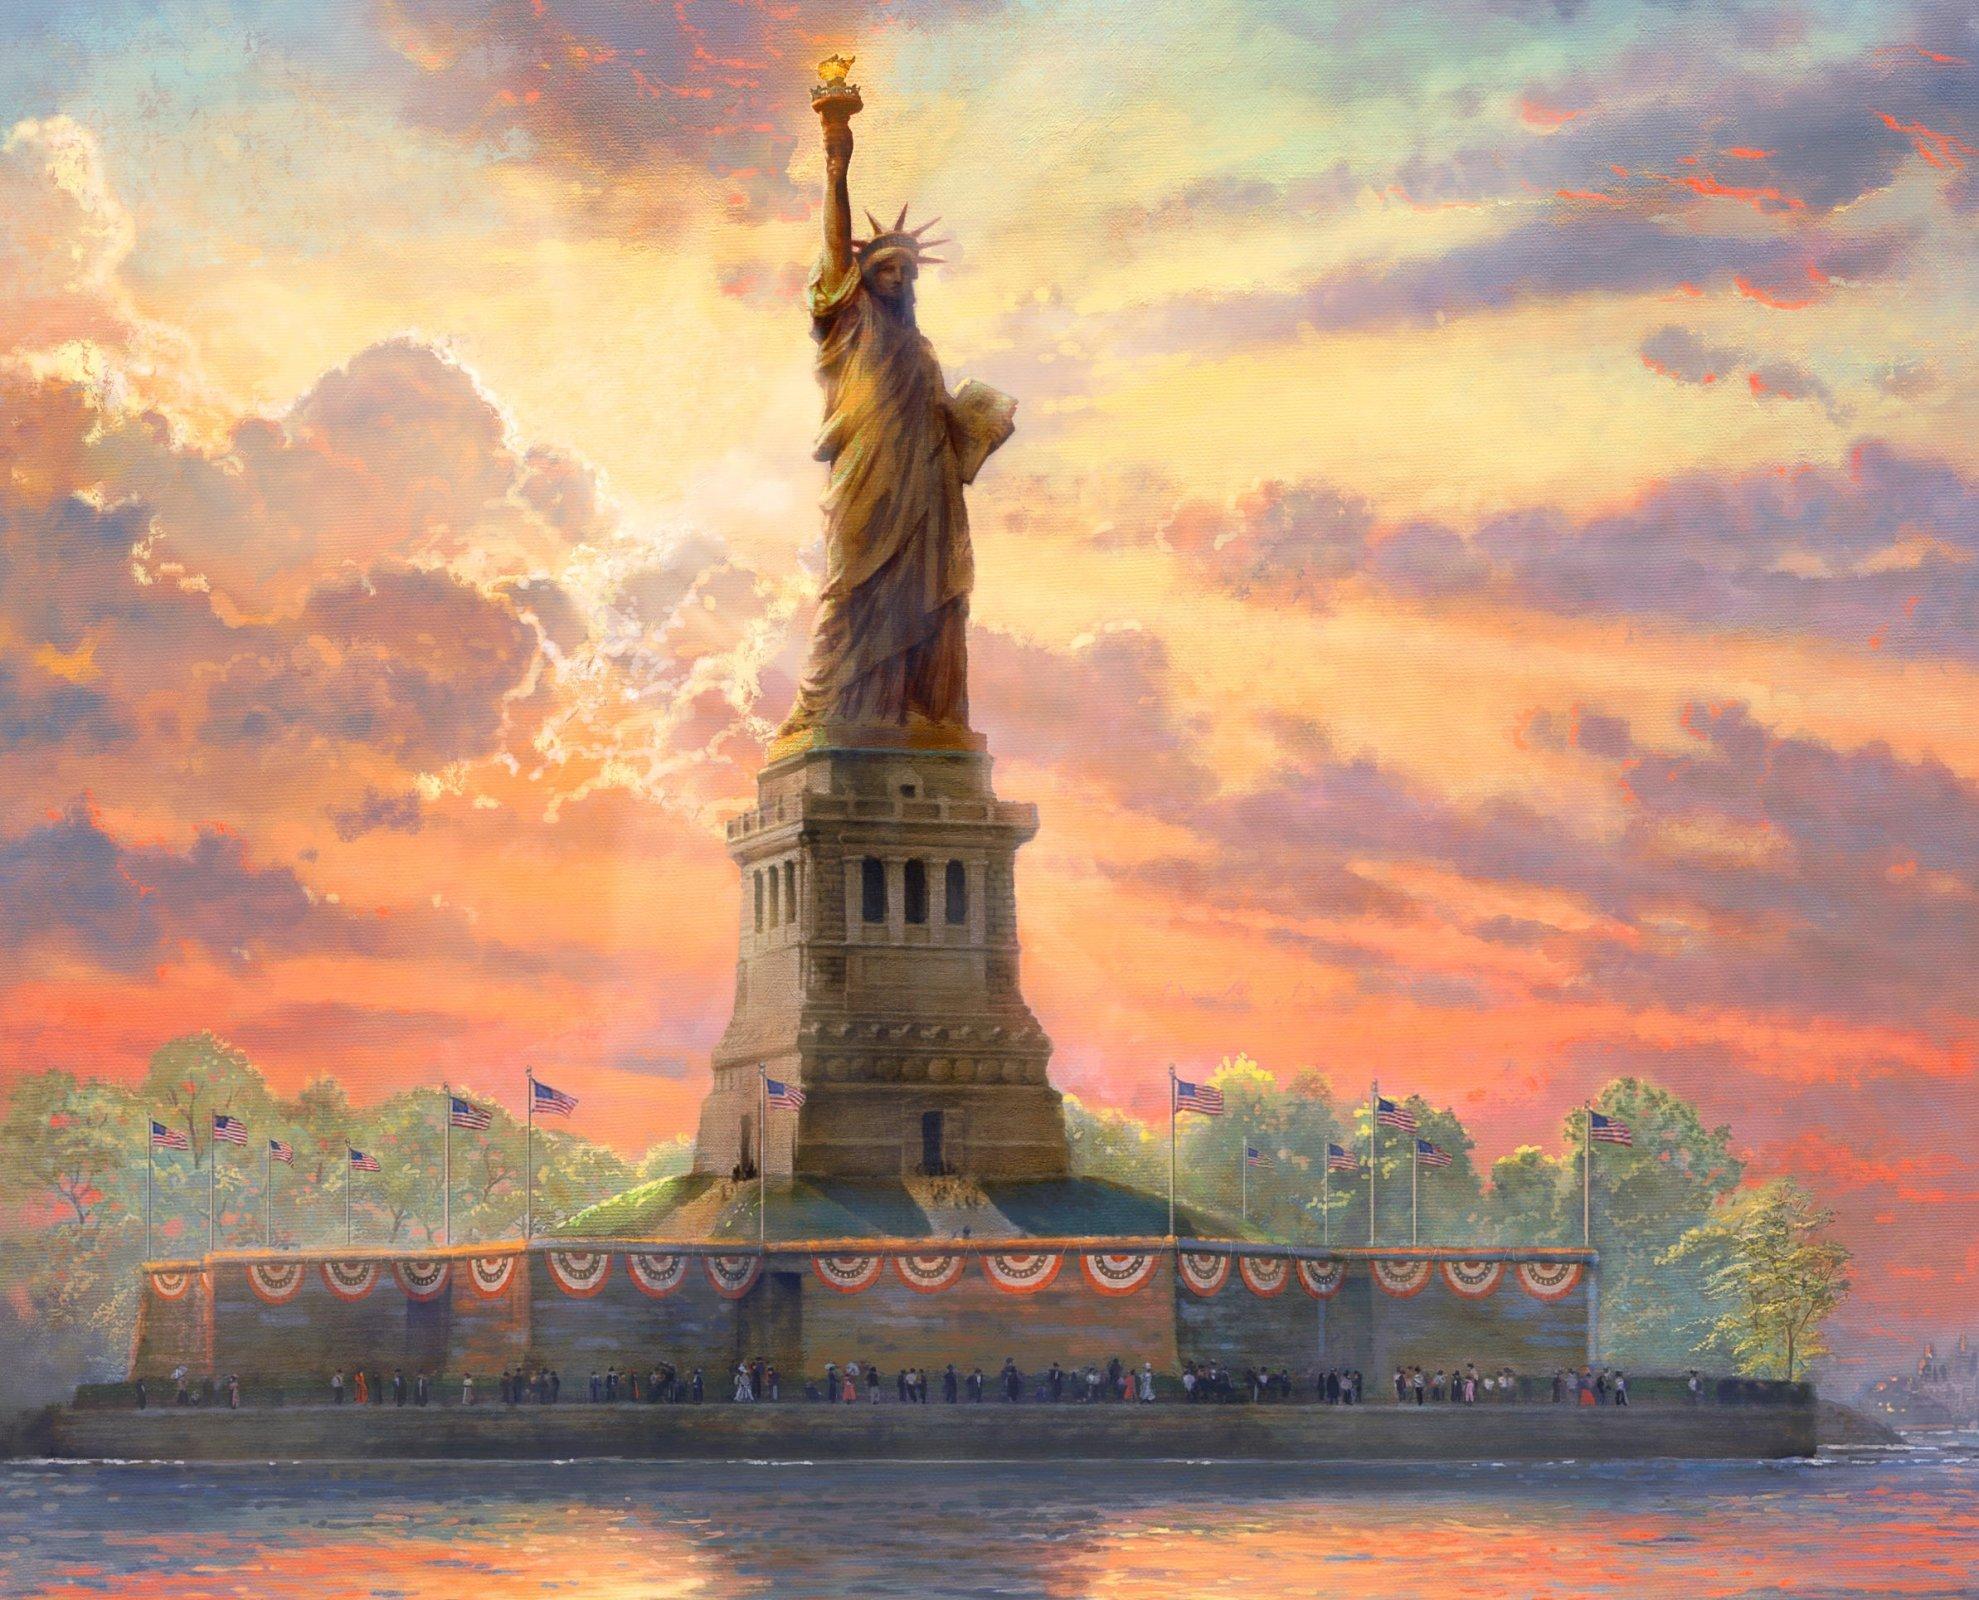 Thomas Kinkade Statue of Liberty 2036 Panel